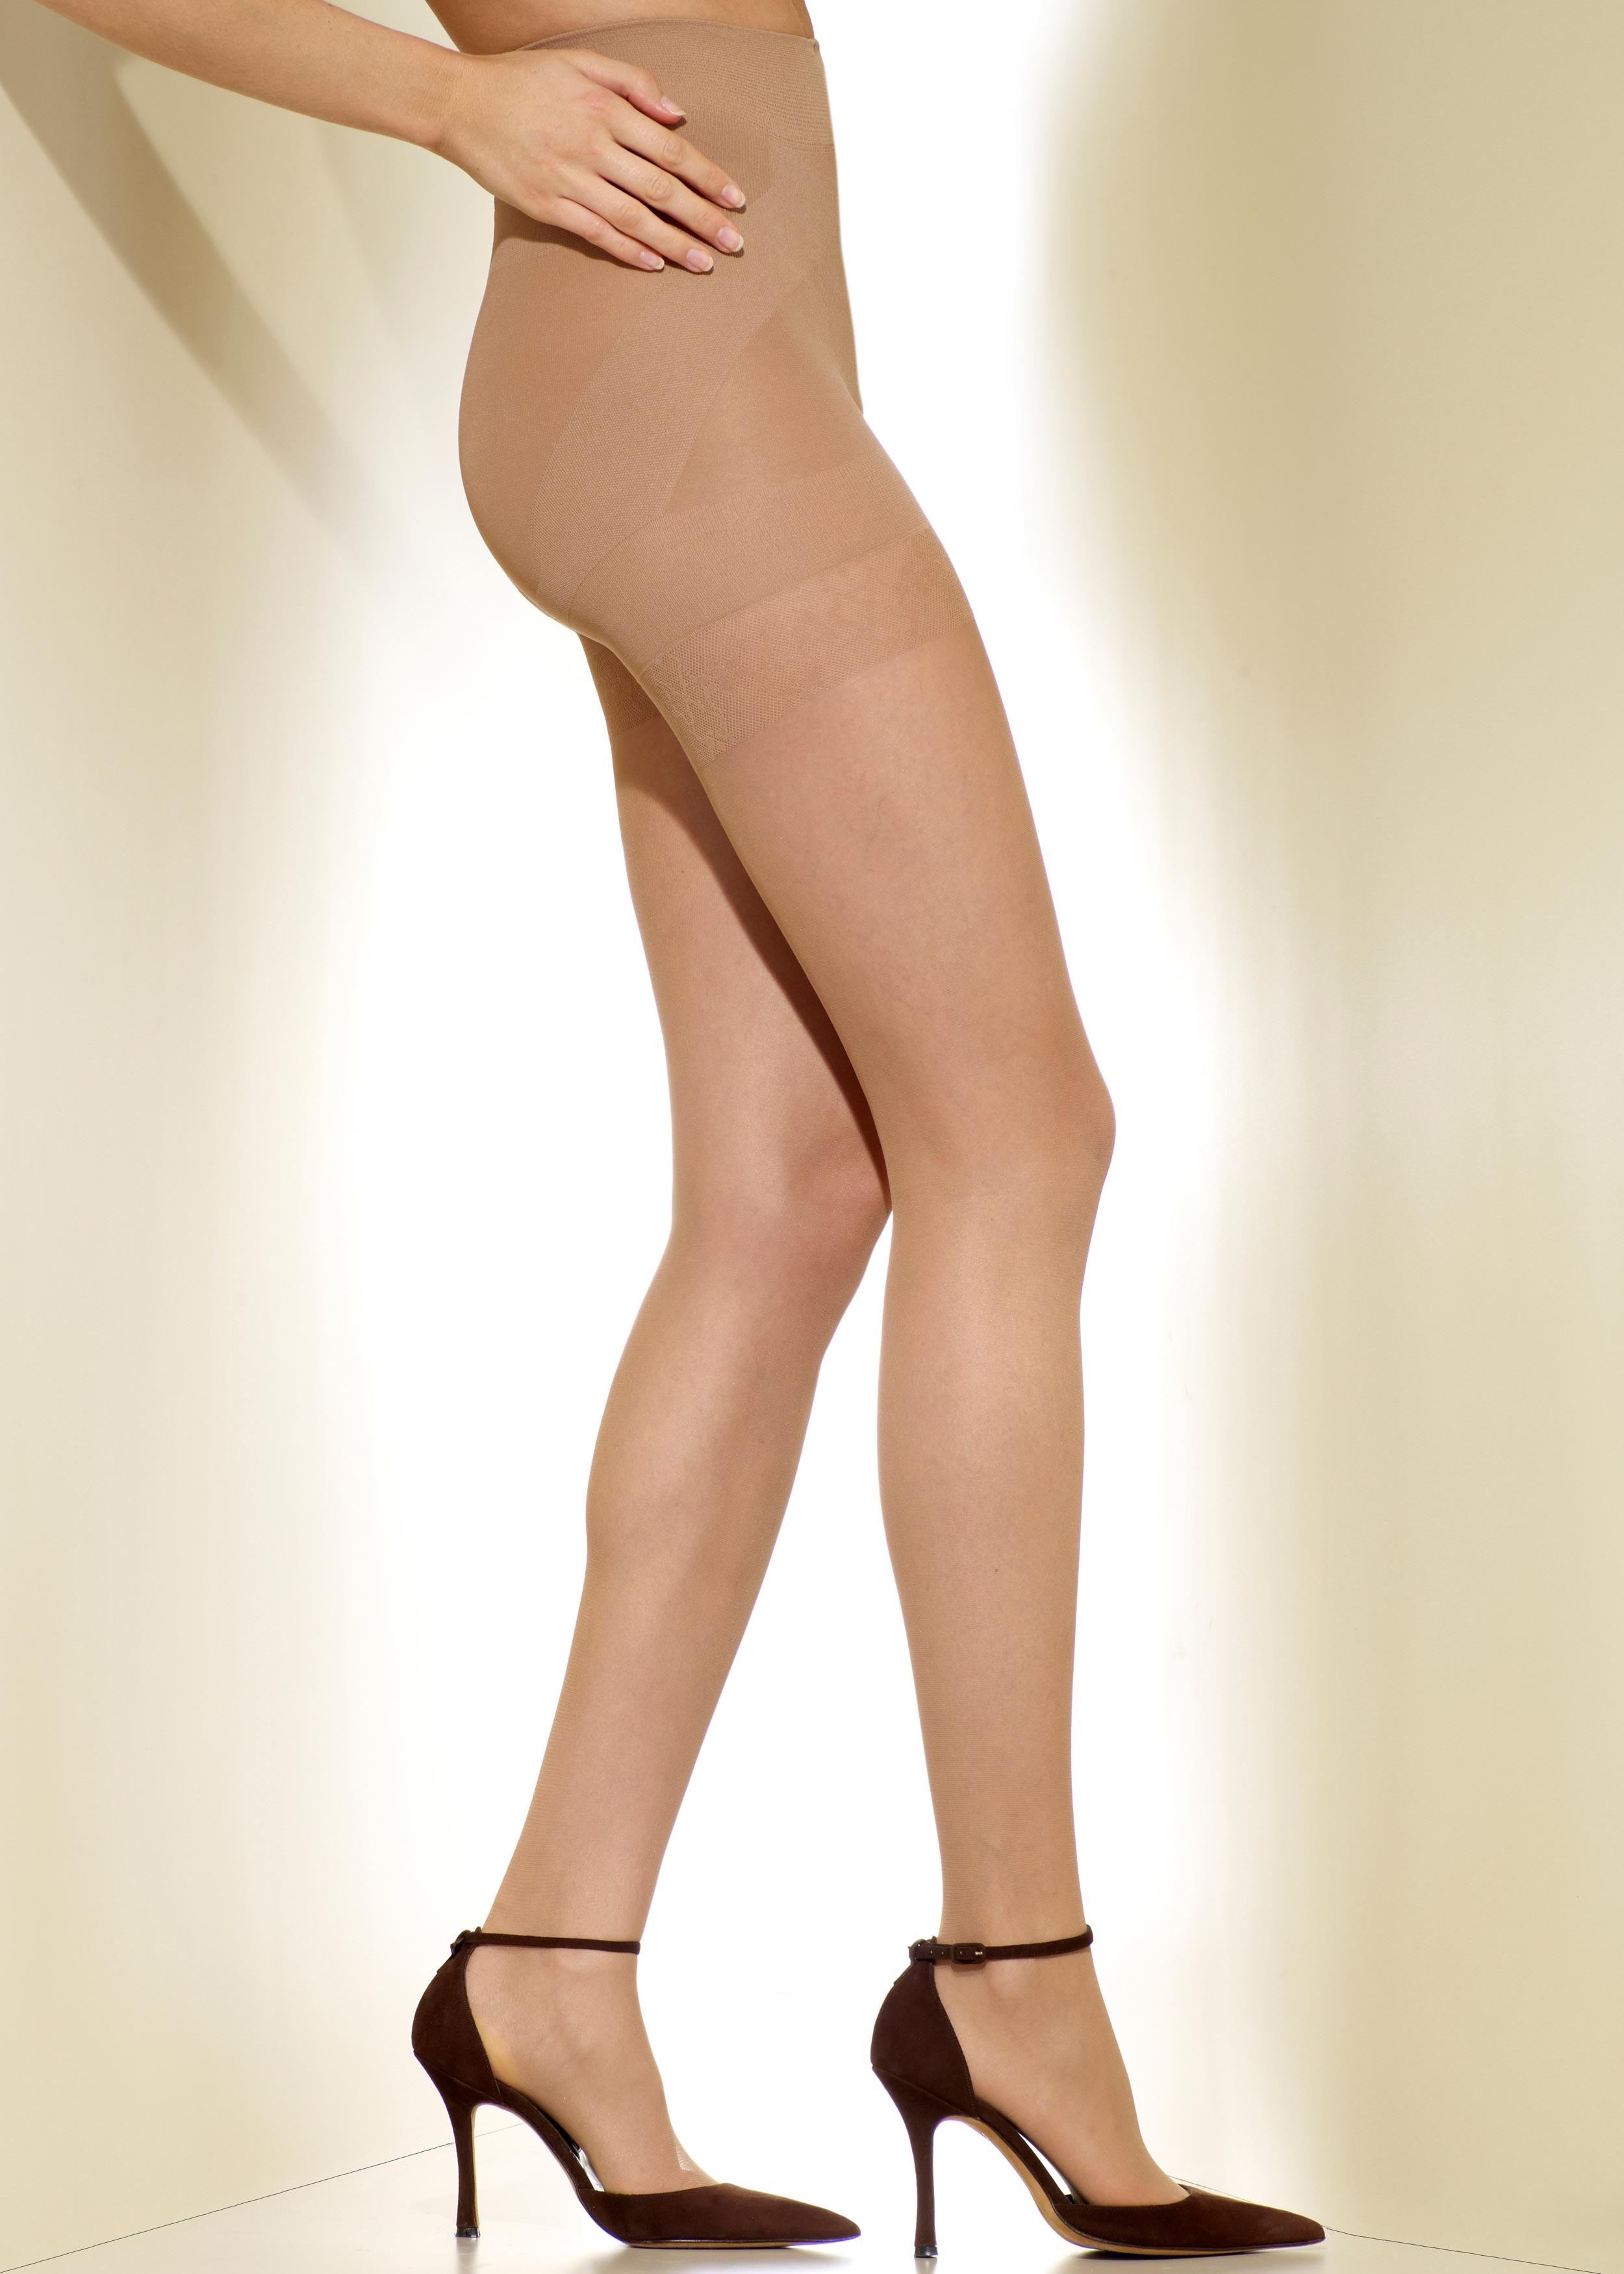 Toe Pantyhose Lined Sheer 22